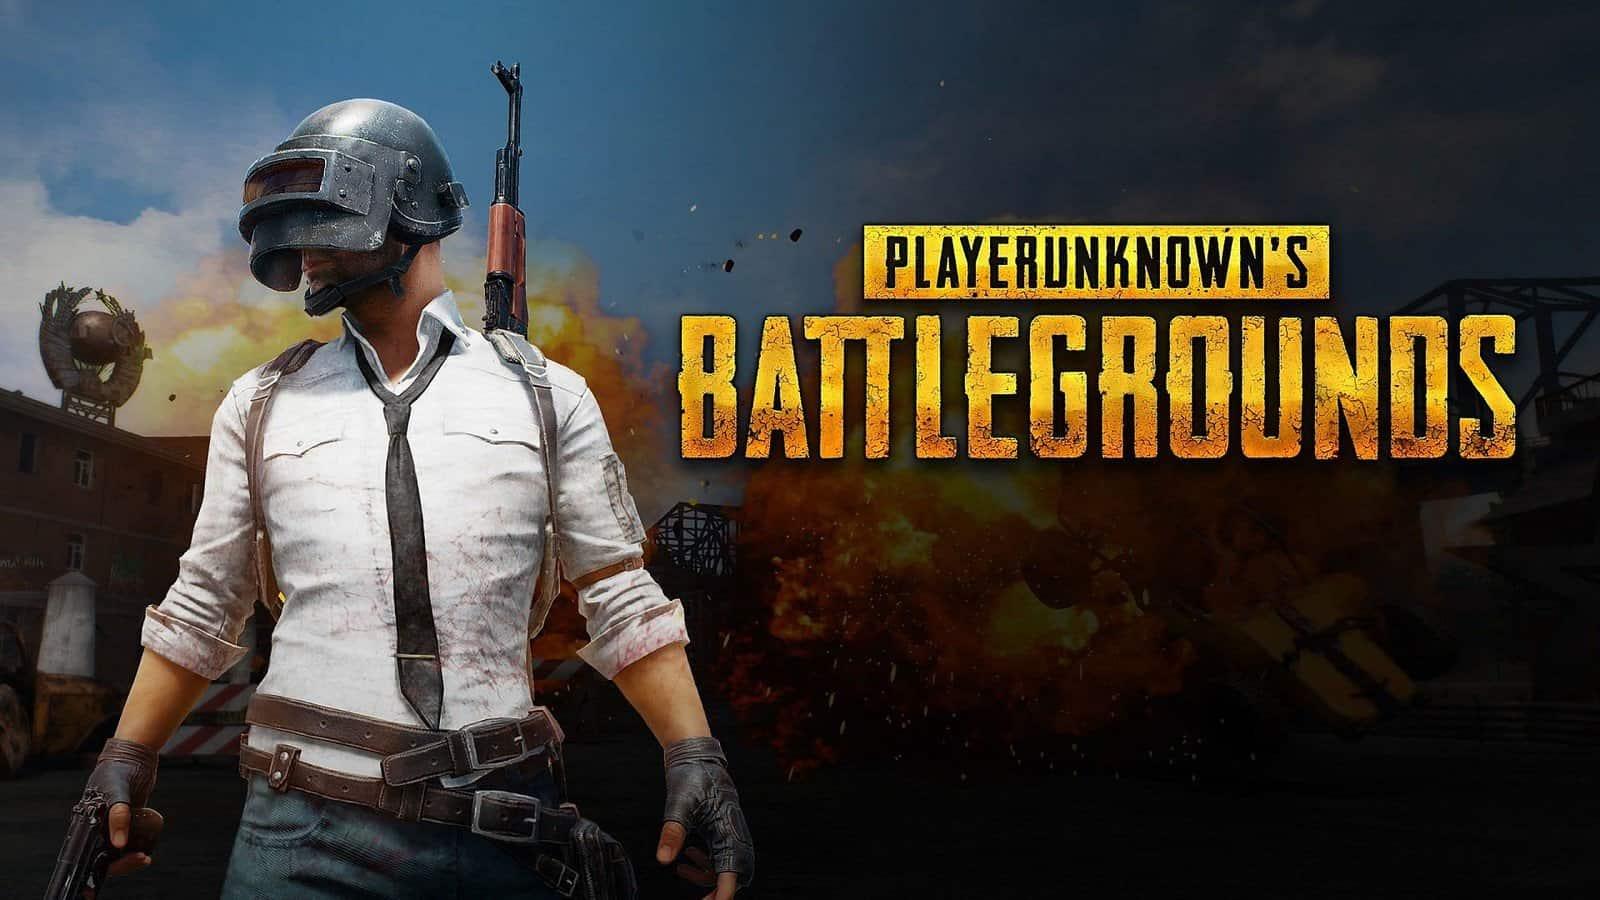 PUBG / PlayerUnknown's Battlegrounds PC Latest Version Game Free Download